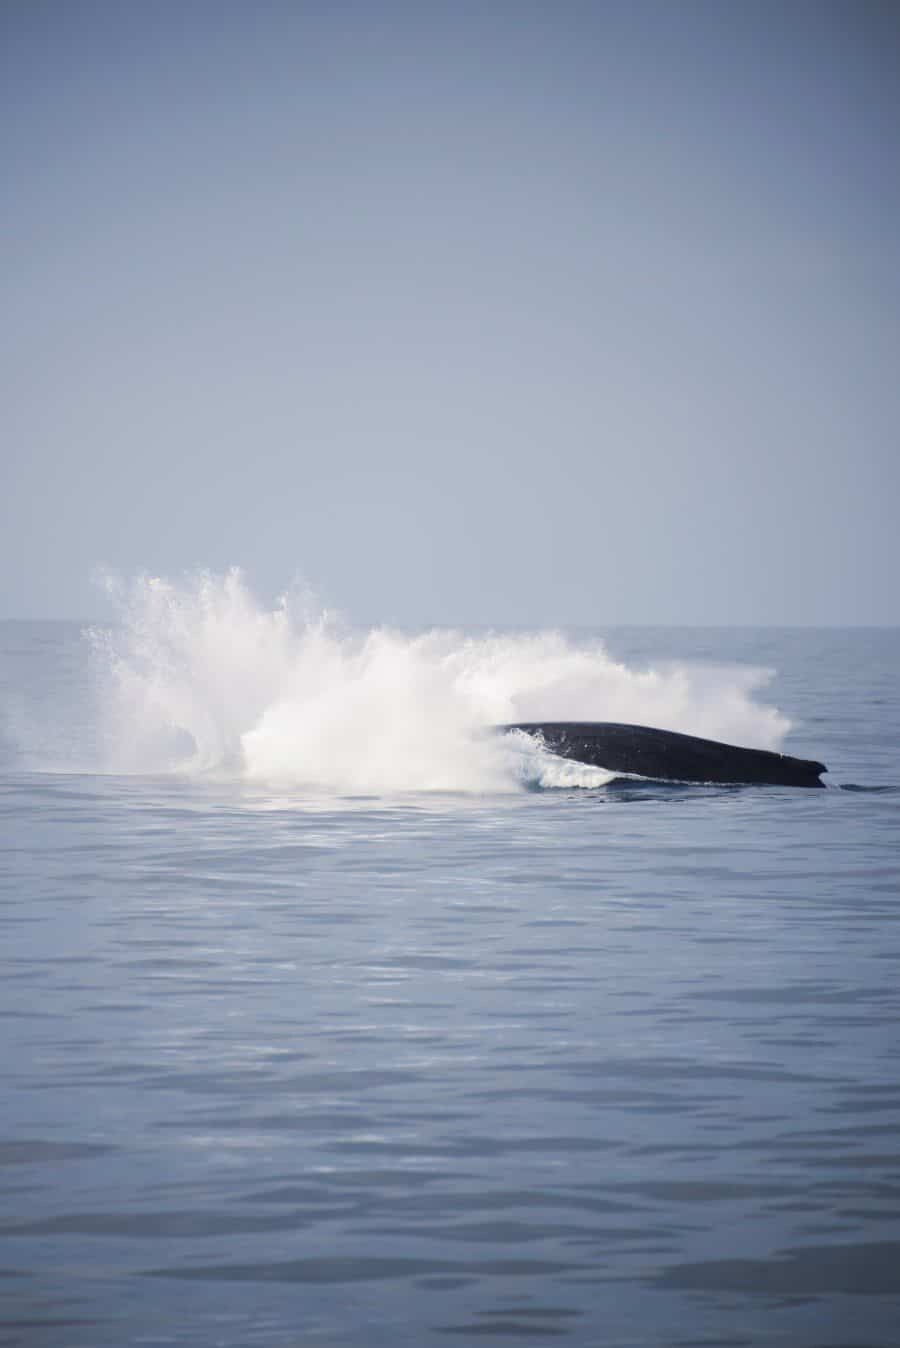 sunshine-coast-whale-swim-queensland-australia-10